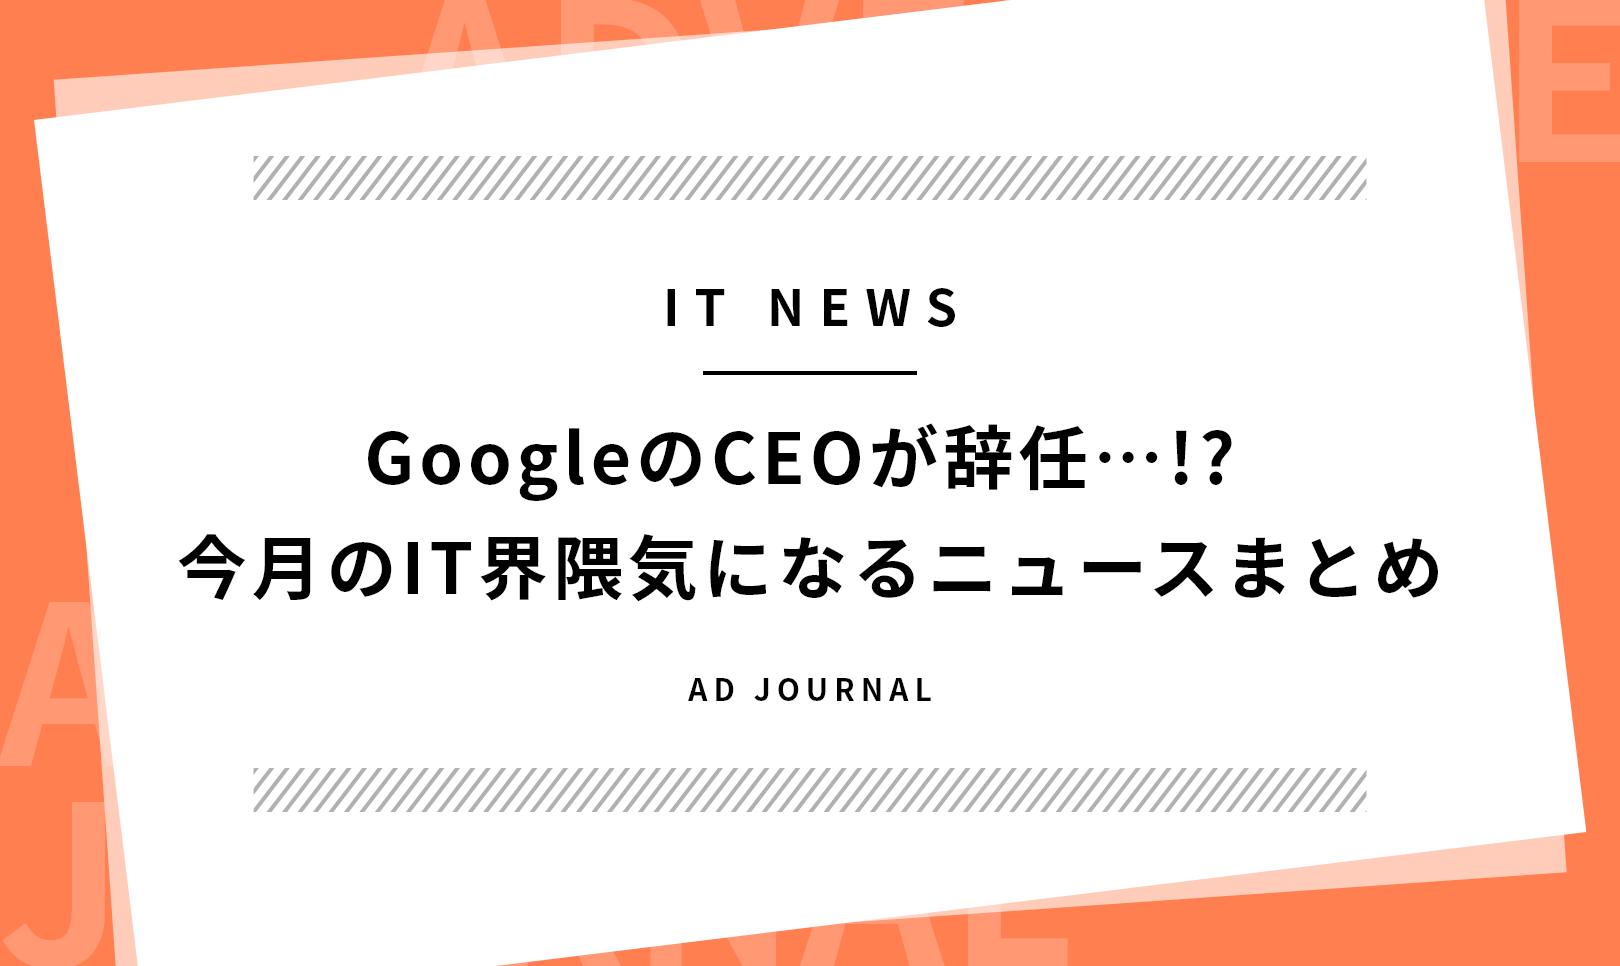 GoogleのCEOが辞任…!? 今月のIT界隈気になるニュースまとめ